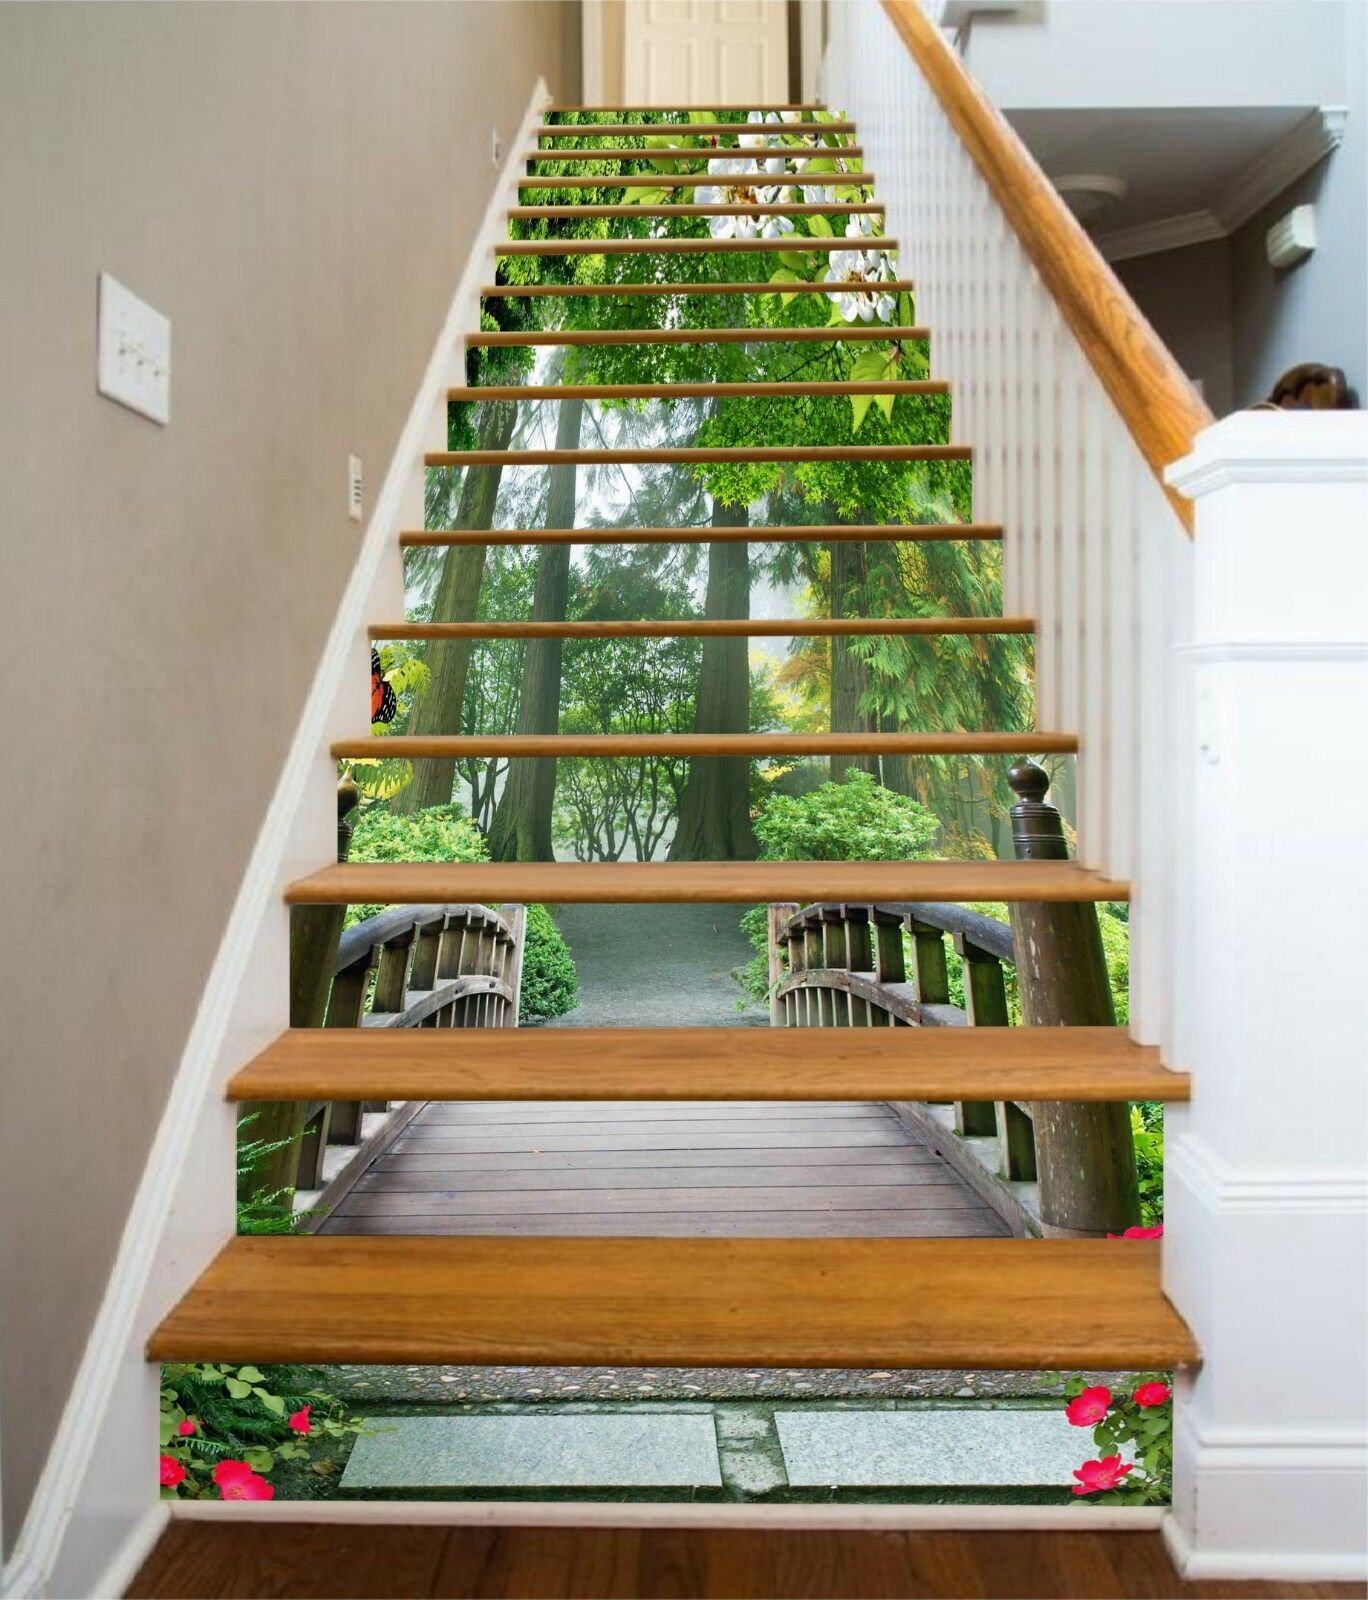 3D Bridge Trees 2 Stair Risers Decoration Photo Mural Vinyl Decal Wallpaper CA